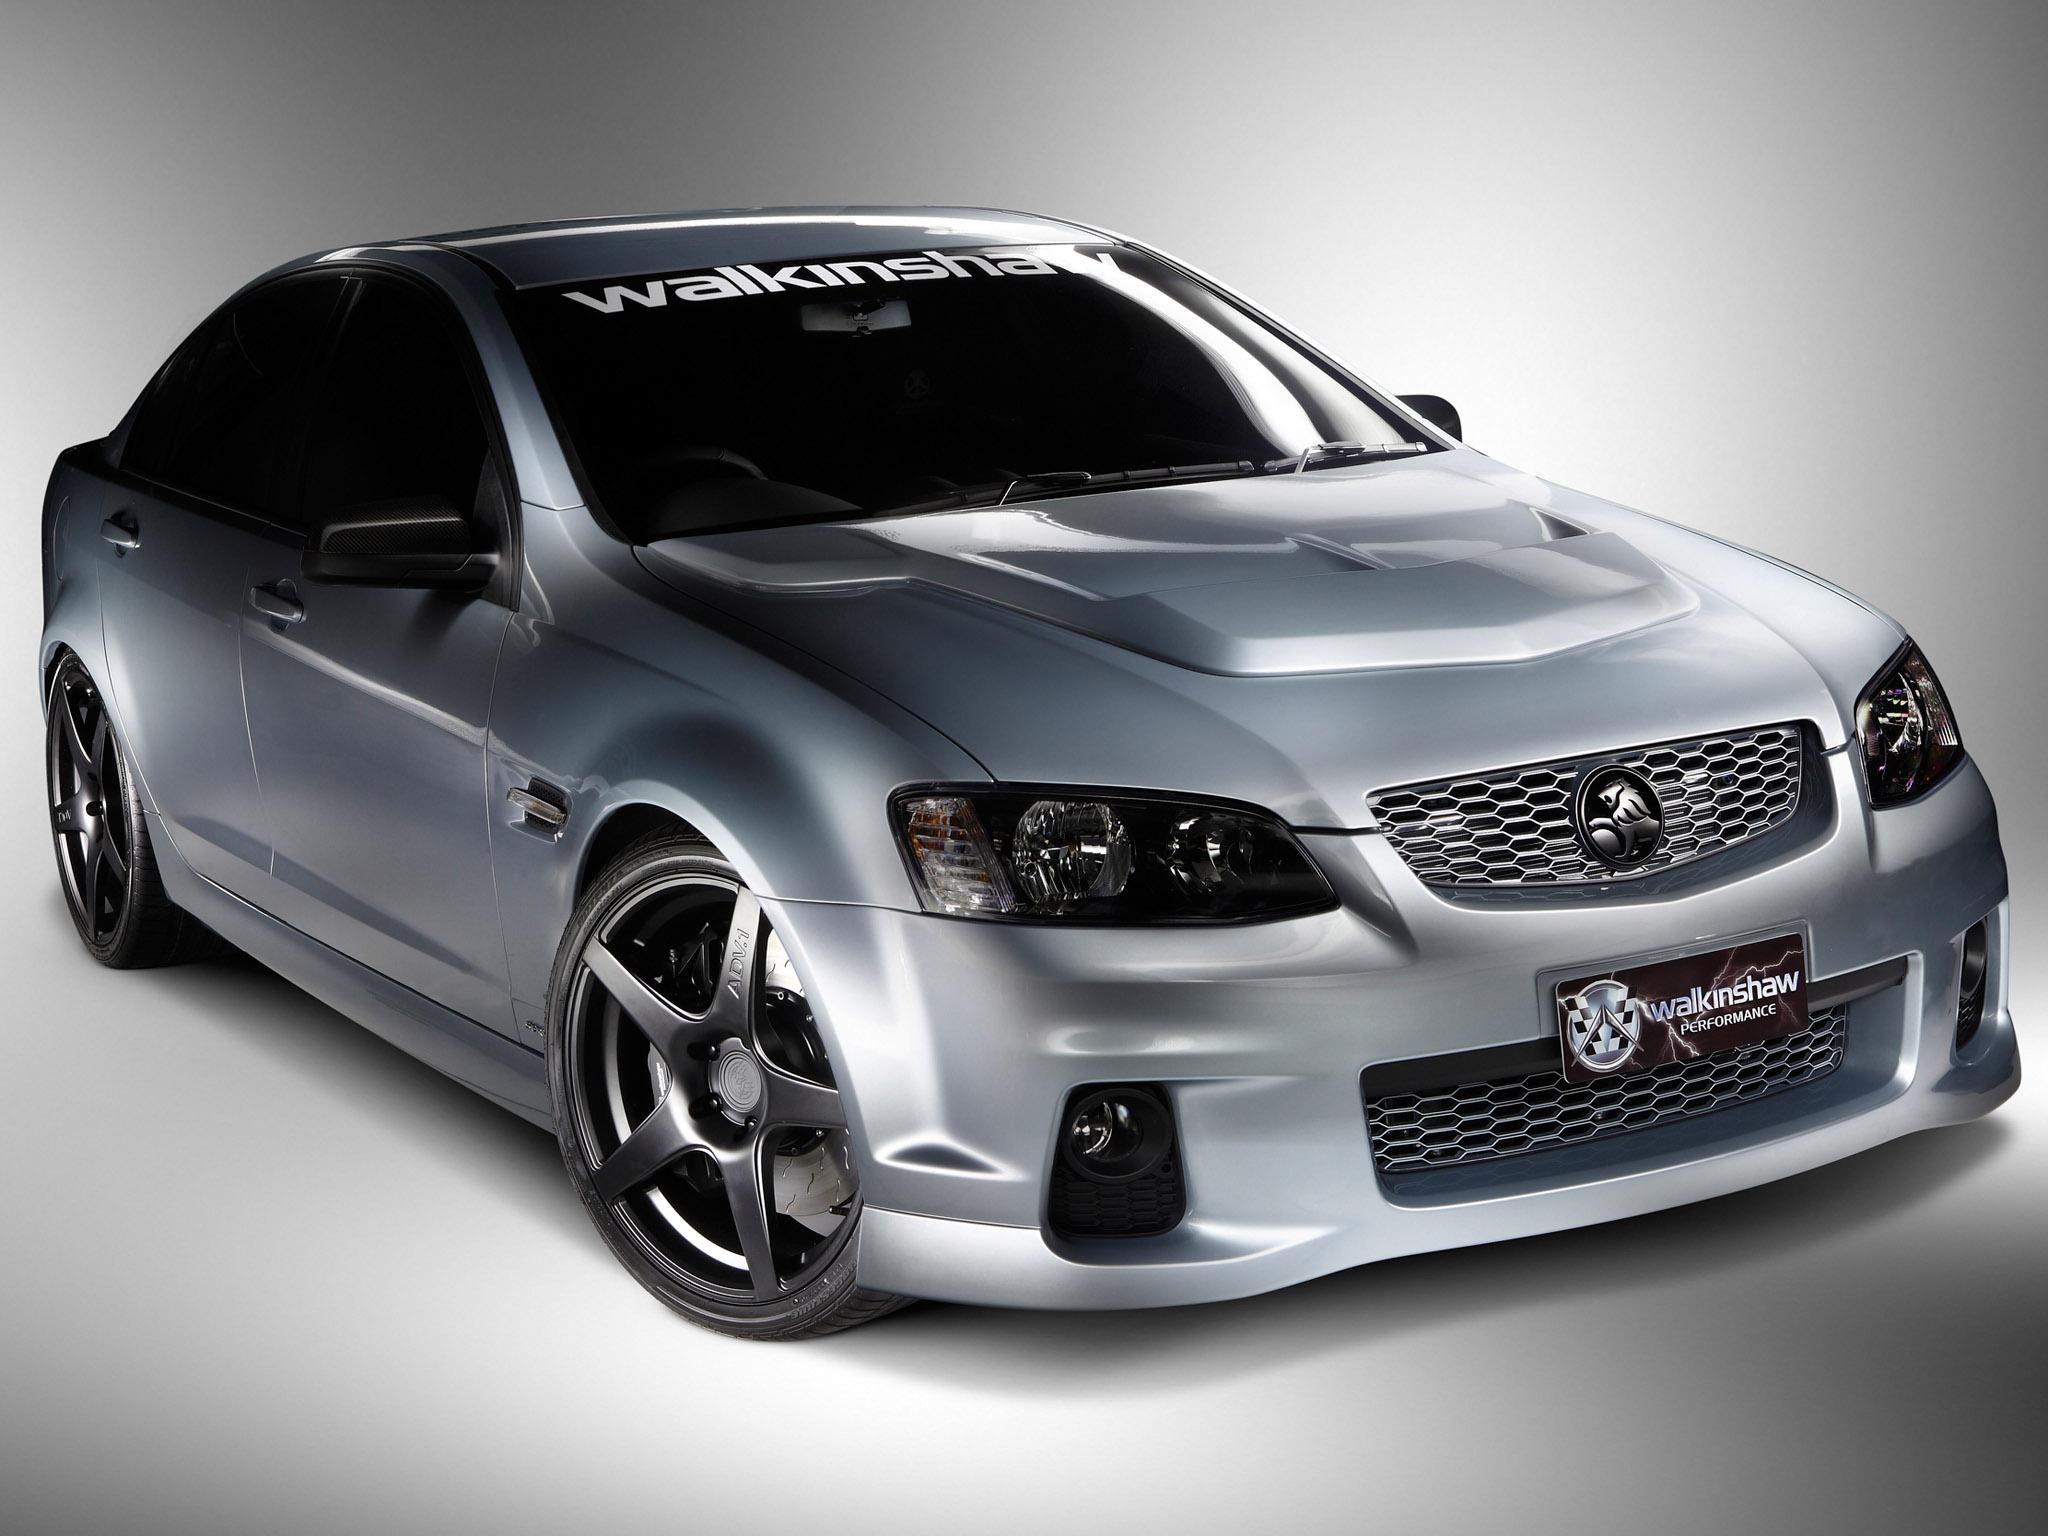 Wallpaper : sports car, 2013, Sedan, Holden, netcarshow